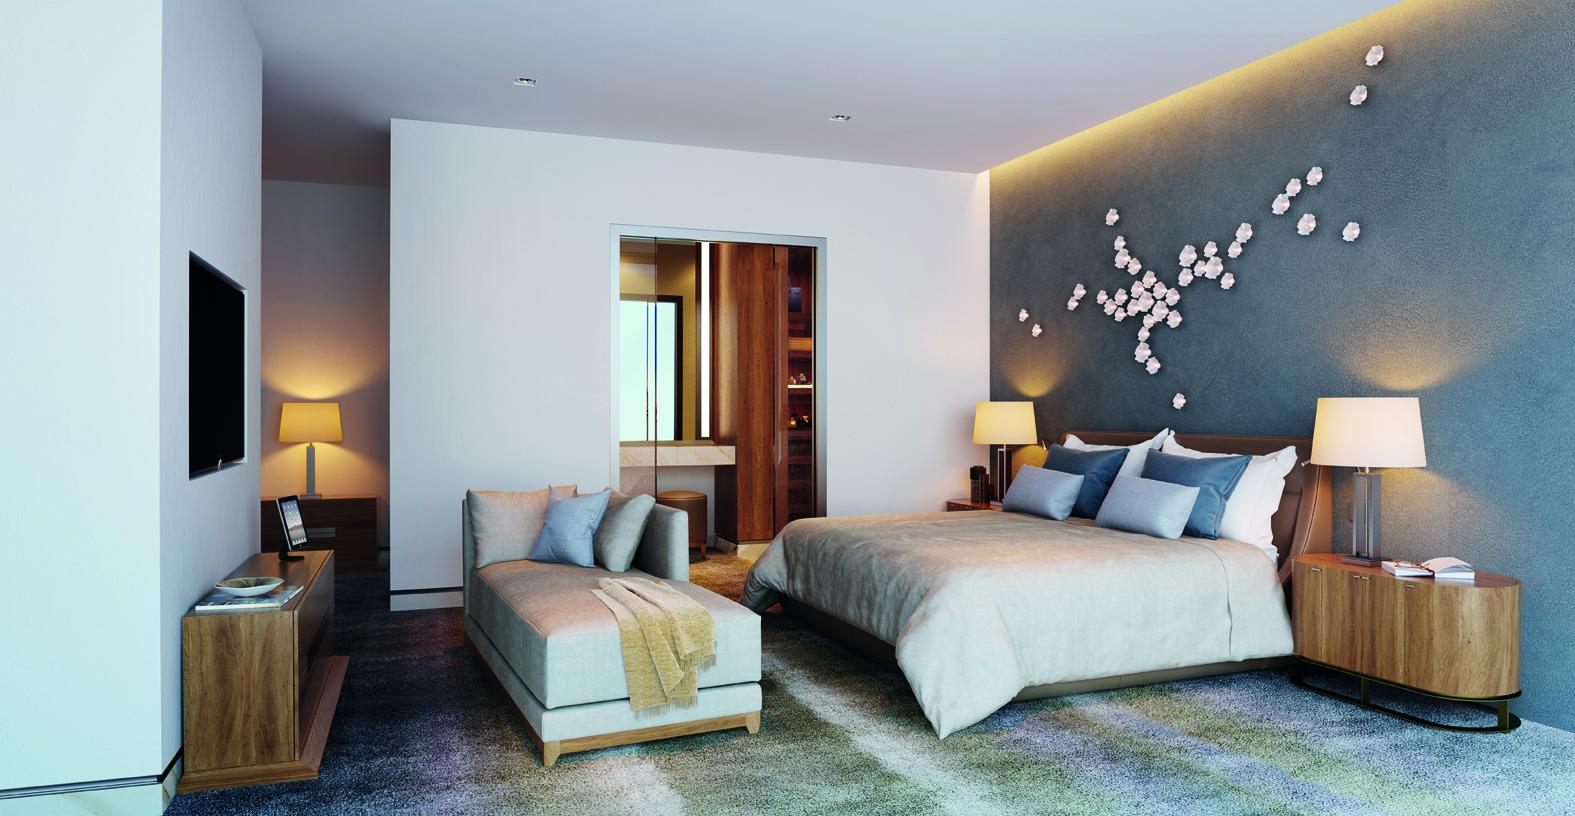 2 BED BEDROOM DAY RT1 CMYK-small.jpg